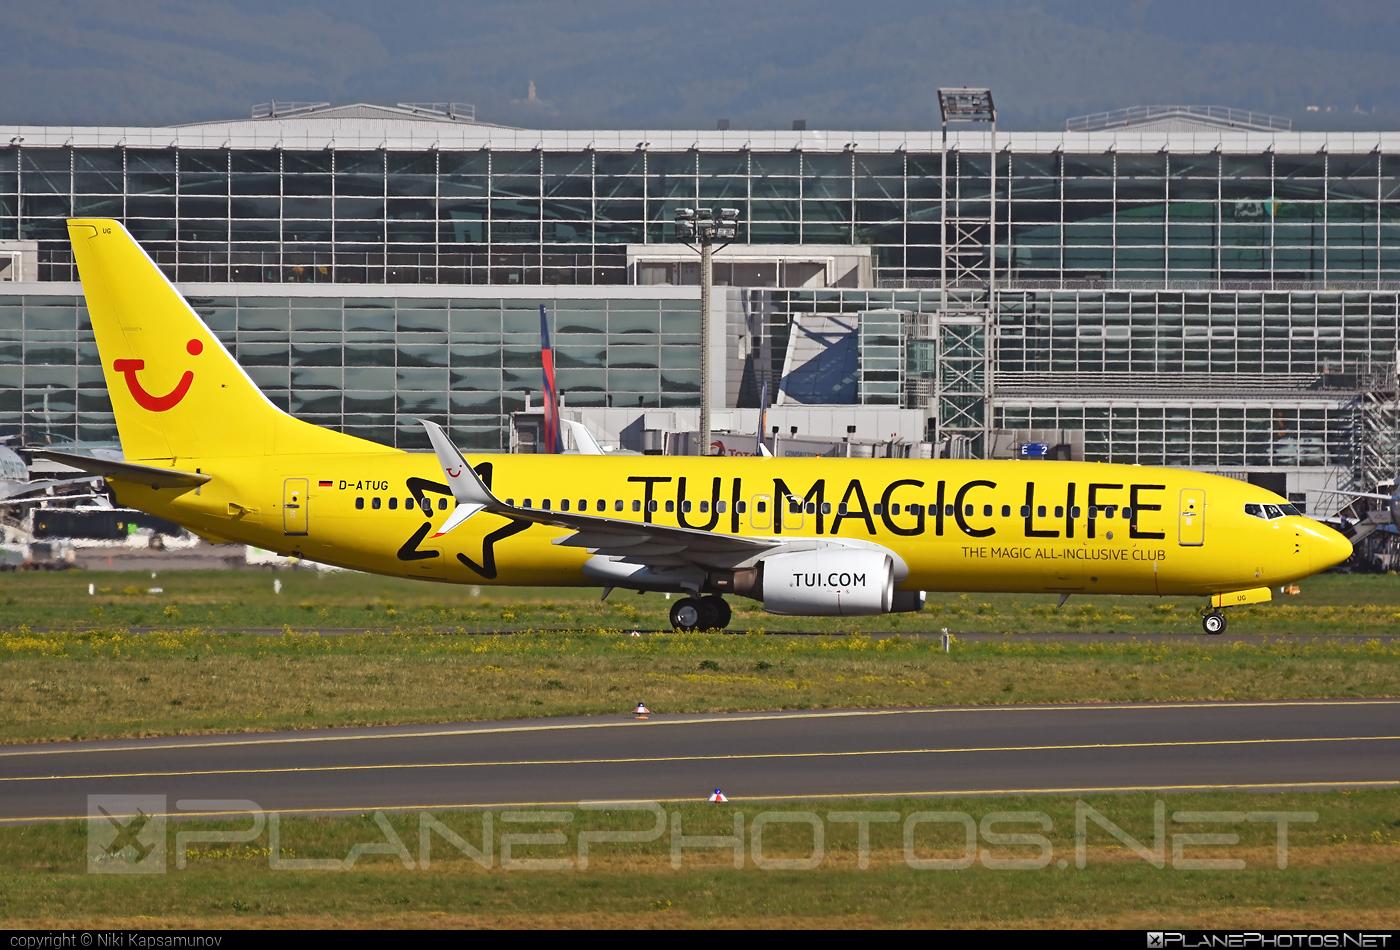 Boeing 737-800 - D-ATUG operated by TUIfly #b737 #b737nextgen #b737ng #boeing #boeing737 #tui #tuifly